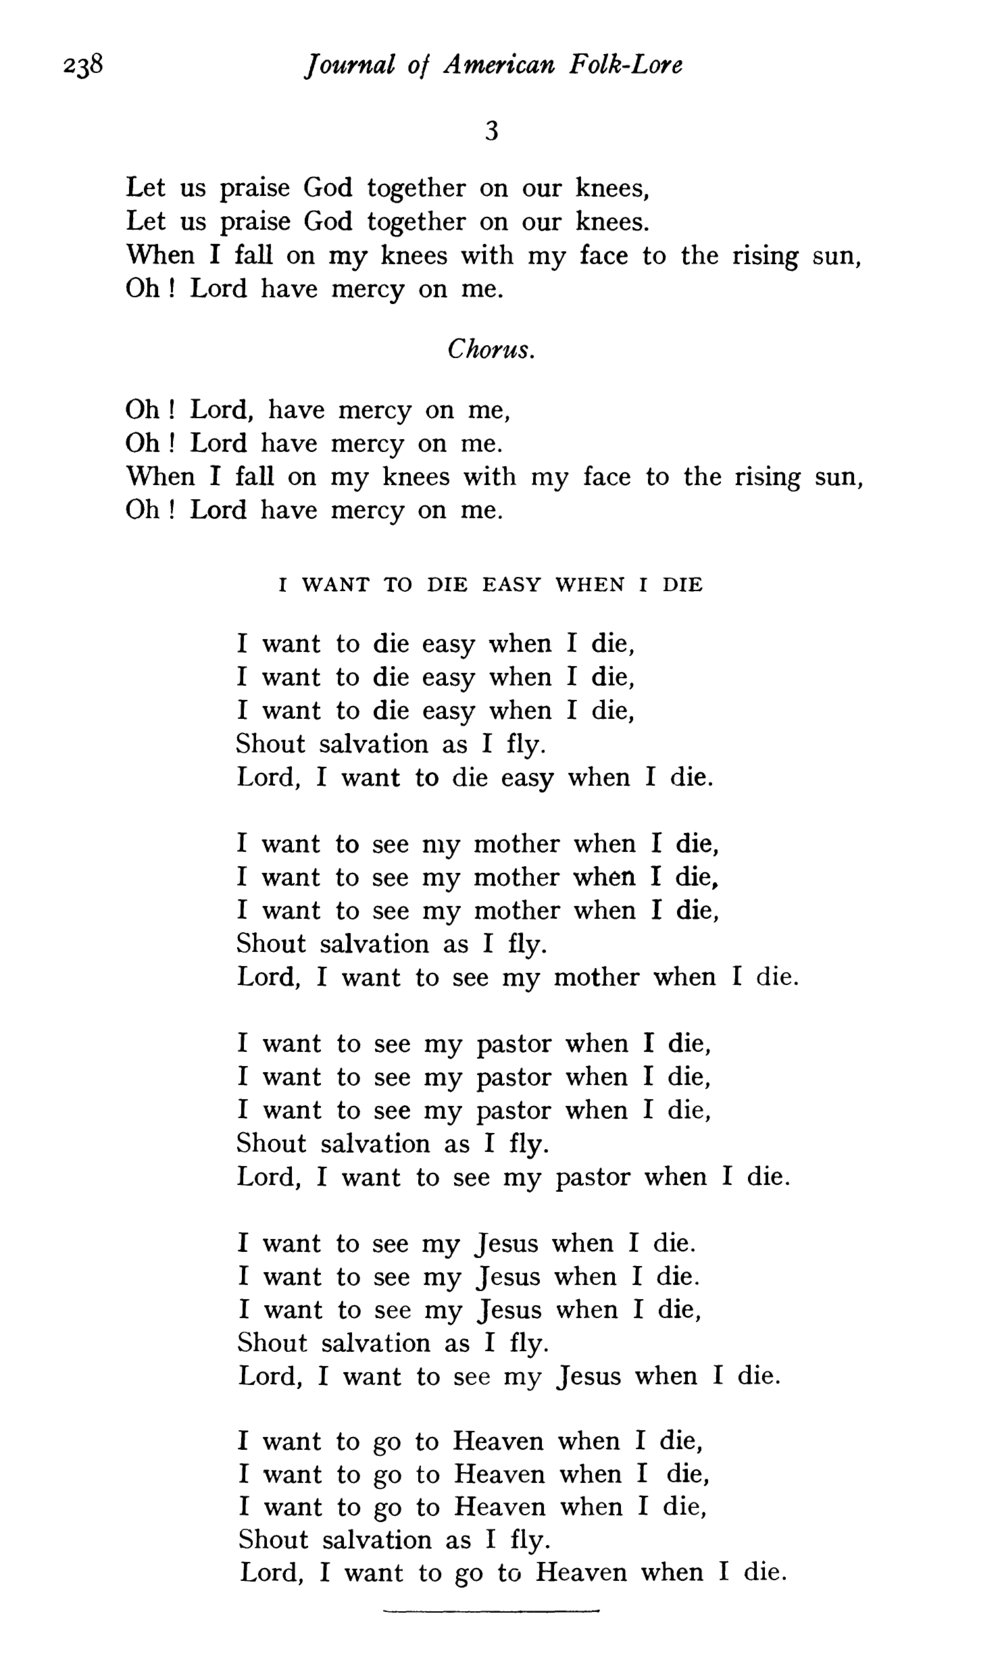 Fig. 1.   Journal of American Folk-Lore,  vol. 38, no. 148 (Apr.–June 1925).